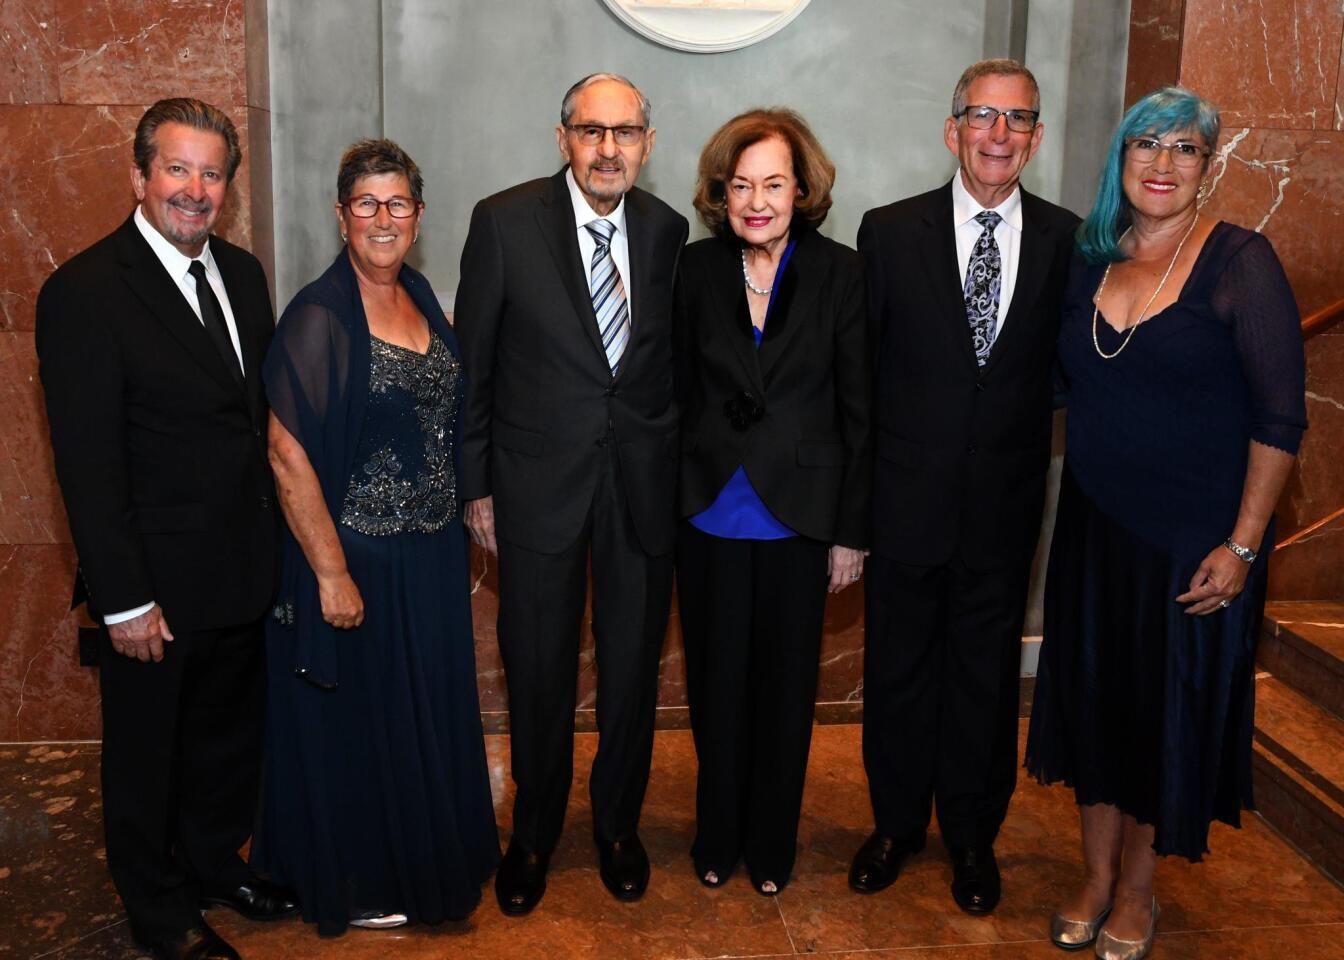 Heart & Soul gala in La Jolla benefits Jewish Family Service of San Diego